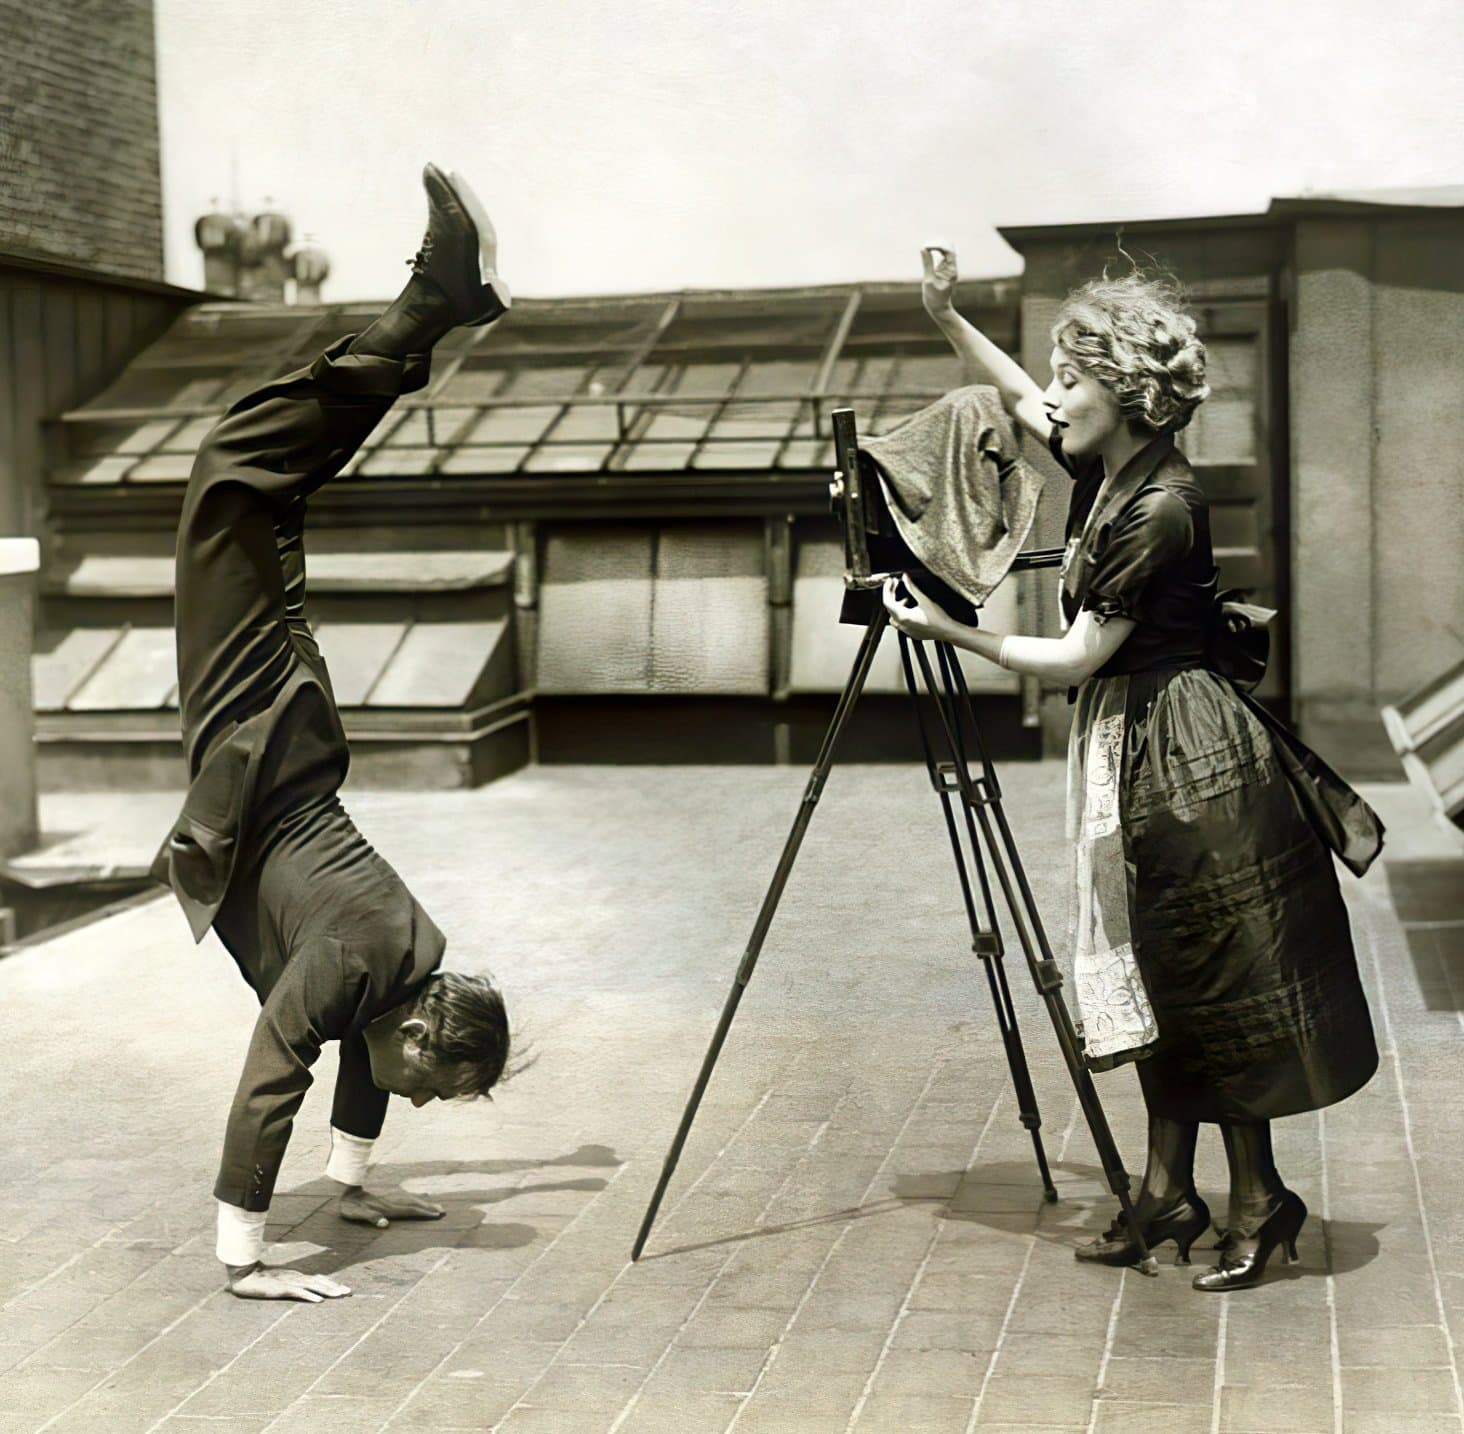 Douglas Fairbanks and Mary Pickford - Ritz Carlton Hotel NYC roof (1920)